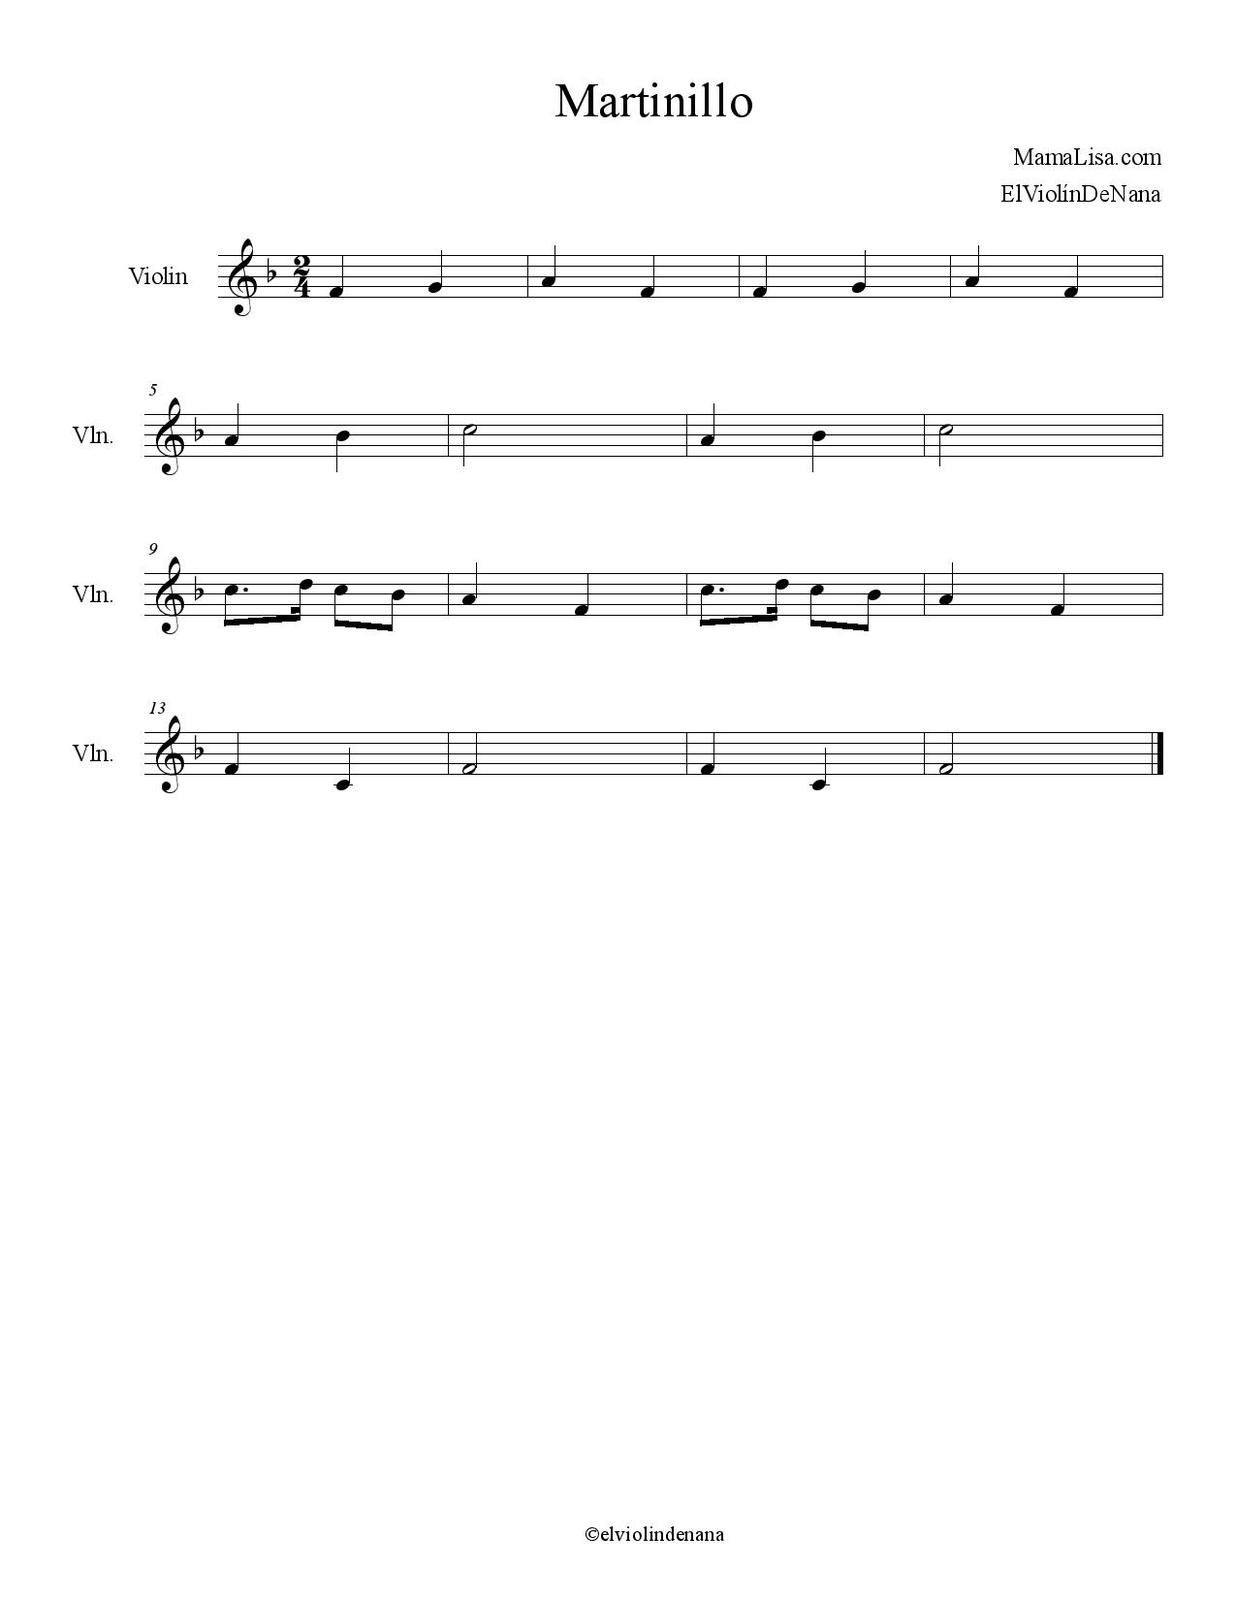 Partitura de la Canción &quot&#x3B;Martinillo&quot&#x3B; | Canción Infantil